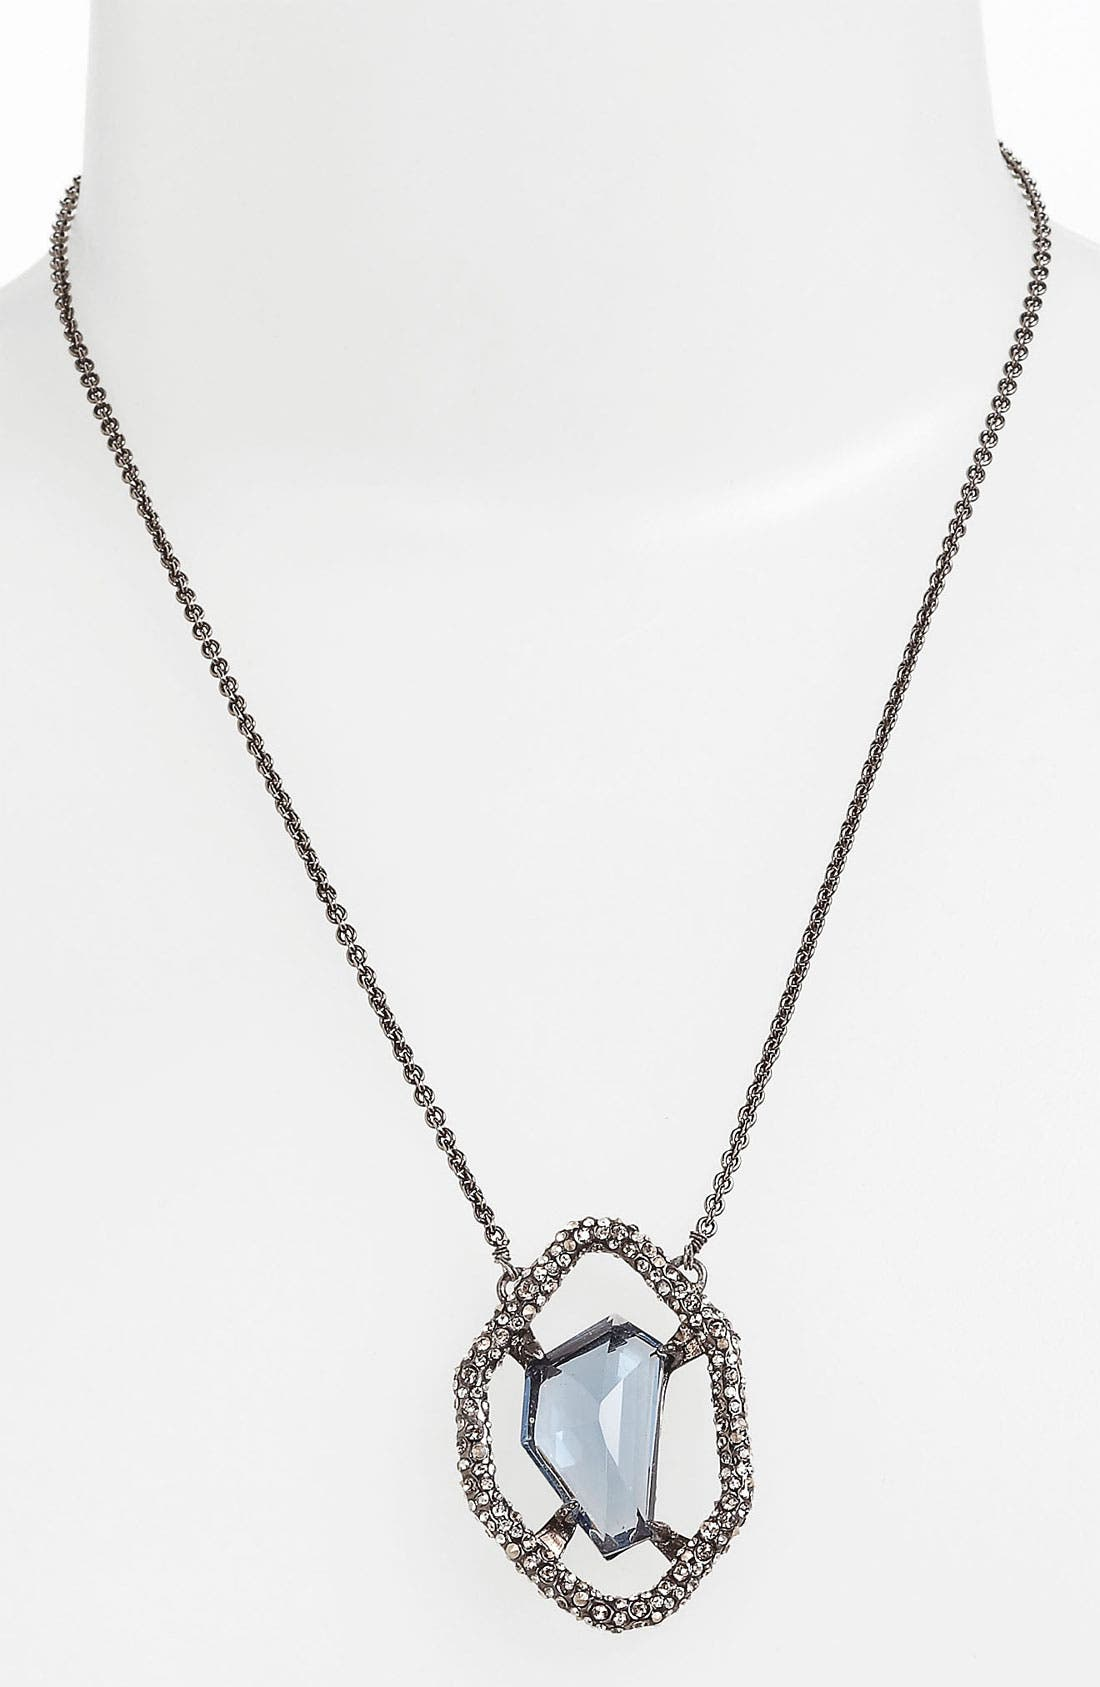 Main Image - Alexis Bittar 'Miss Havisham - Delano' Deco Pendant Necklace (Nordstrom Exclusive)